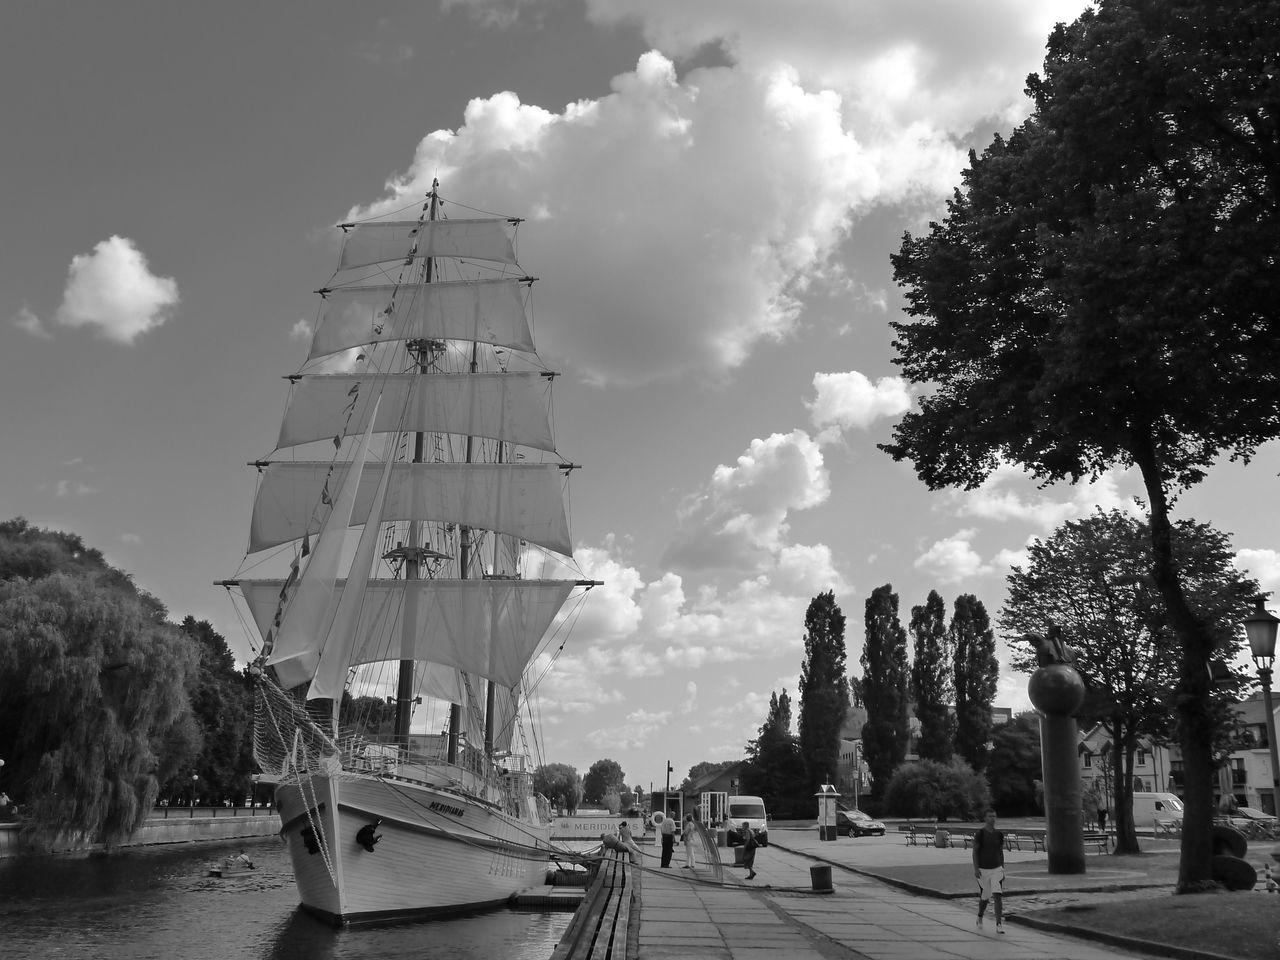 Blackandwhite Cloud - Sky Day Mast Nautical Vessel No People Outdoors Sailing Ship Sea Sky Tall Ship Tree Water